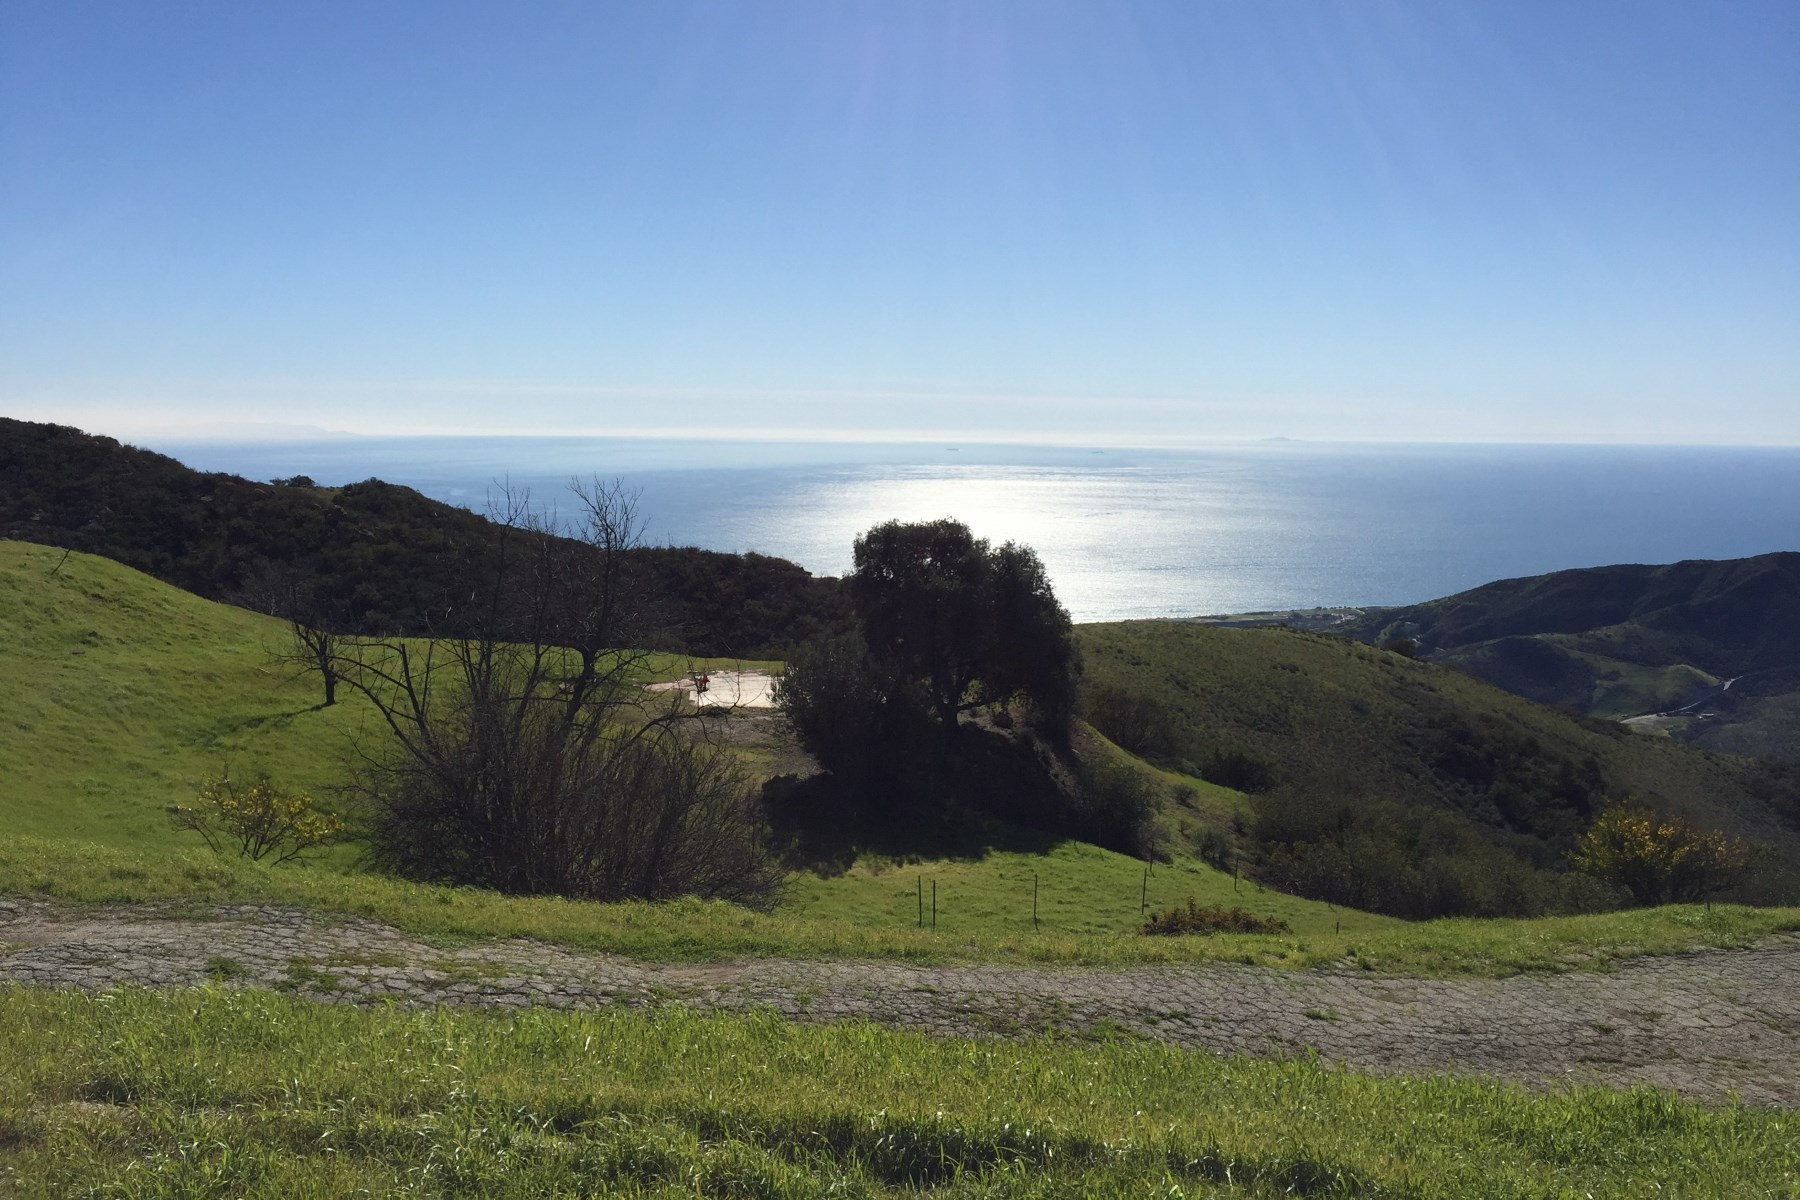 Land for Sale at 80 Acre Potential Ranch 24800 Piuma Rd Malibu, California, 90265 United States